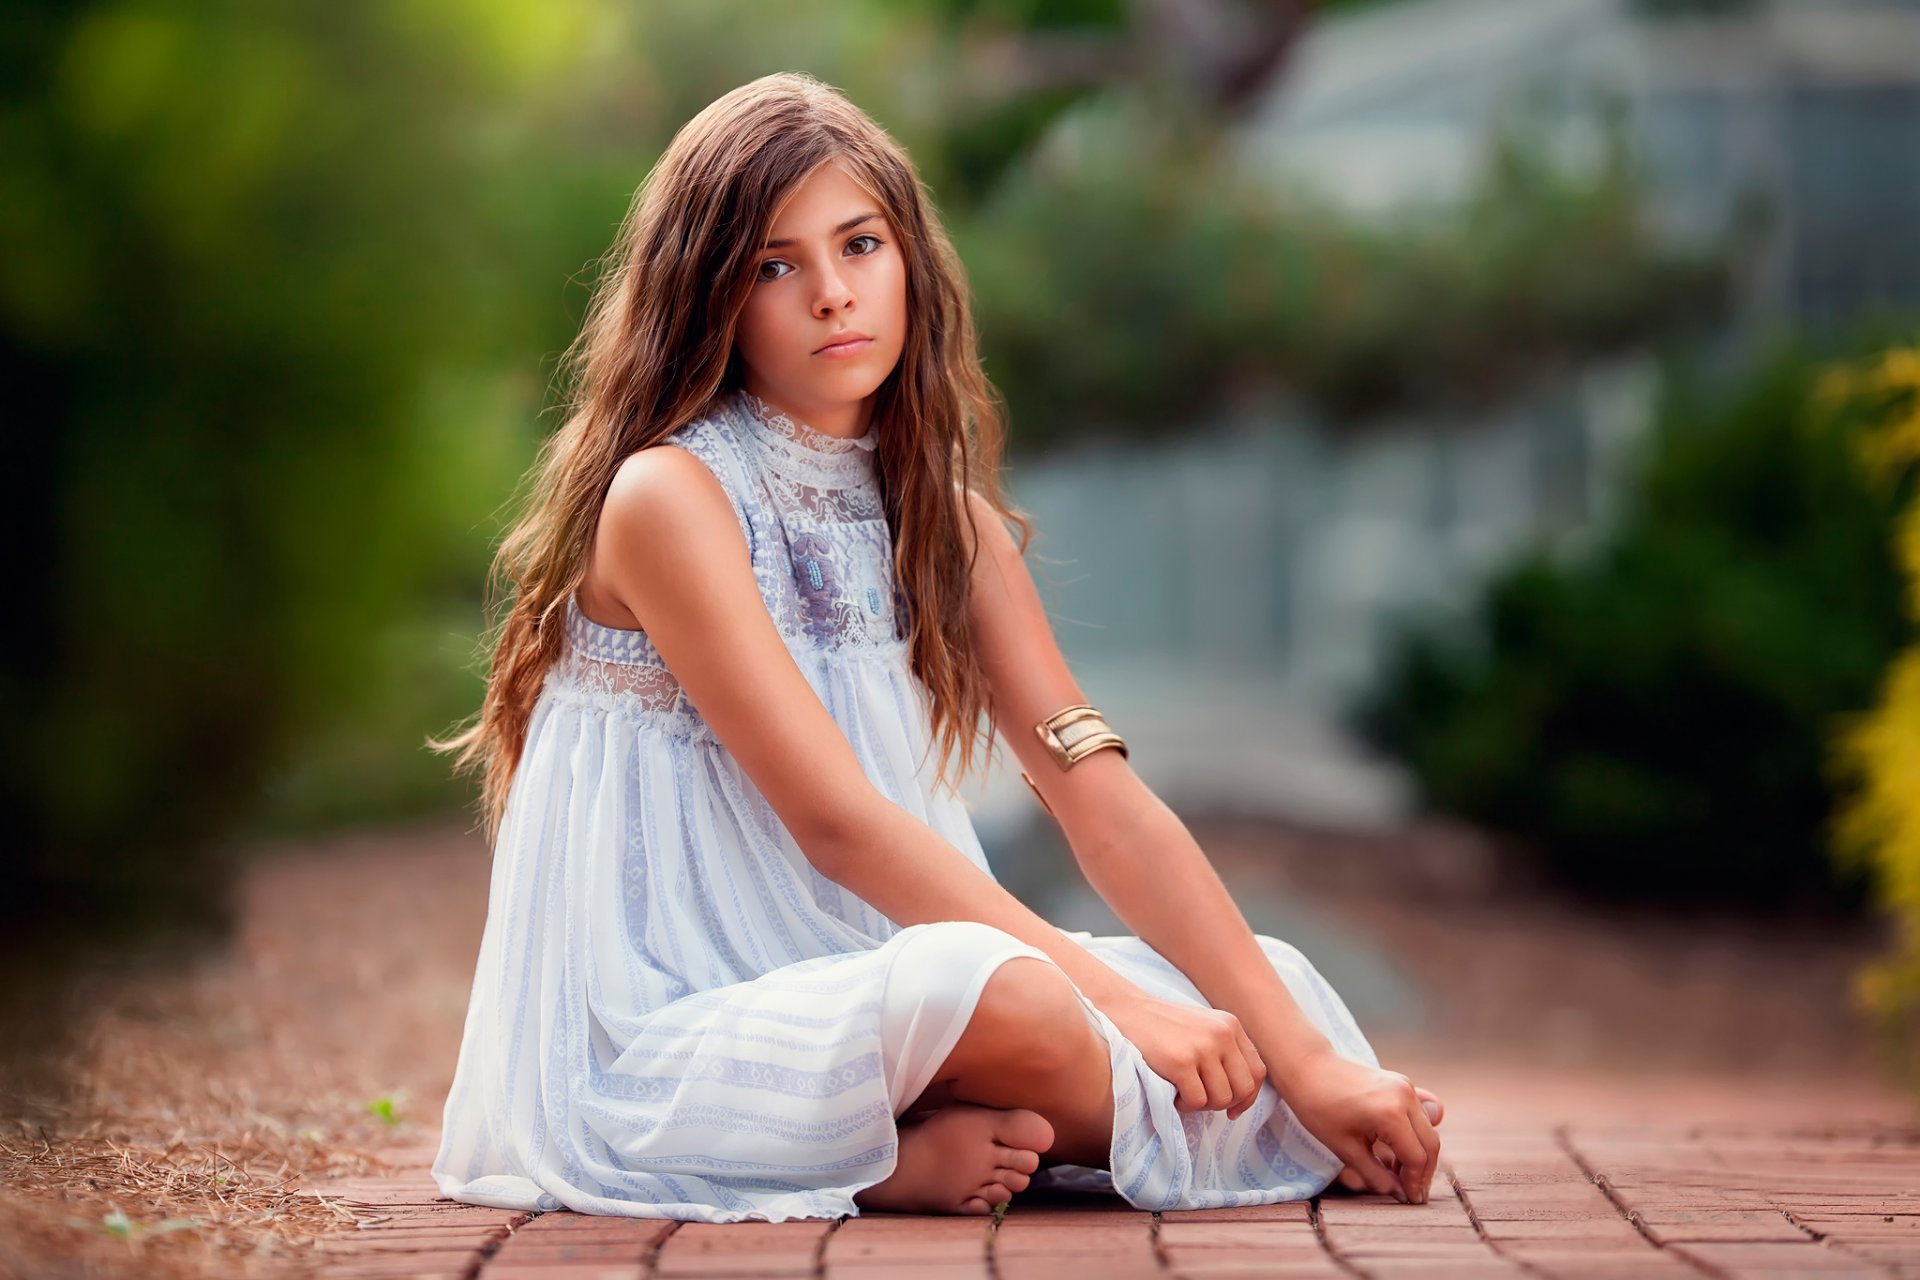 Рисунки, картинки красивой девочки